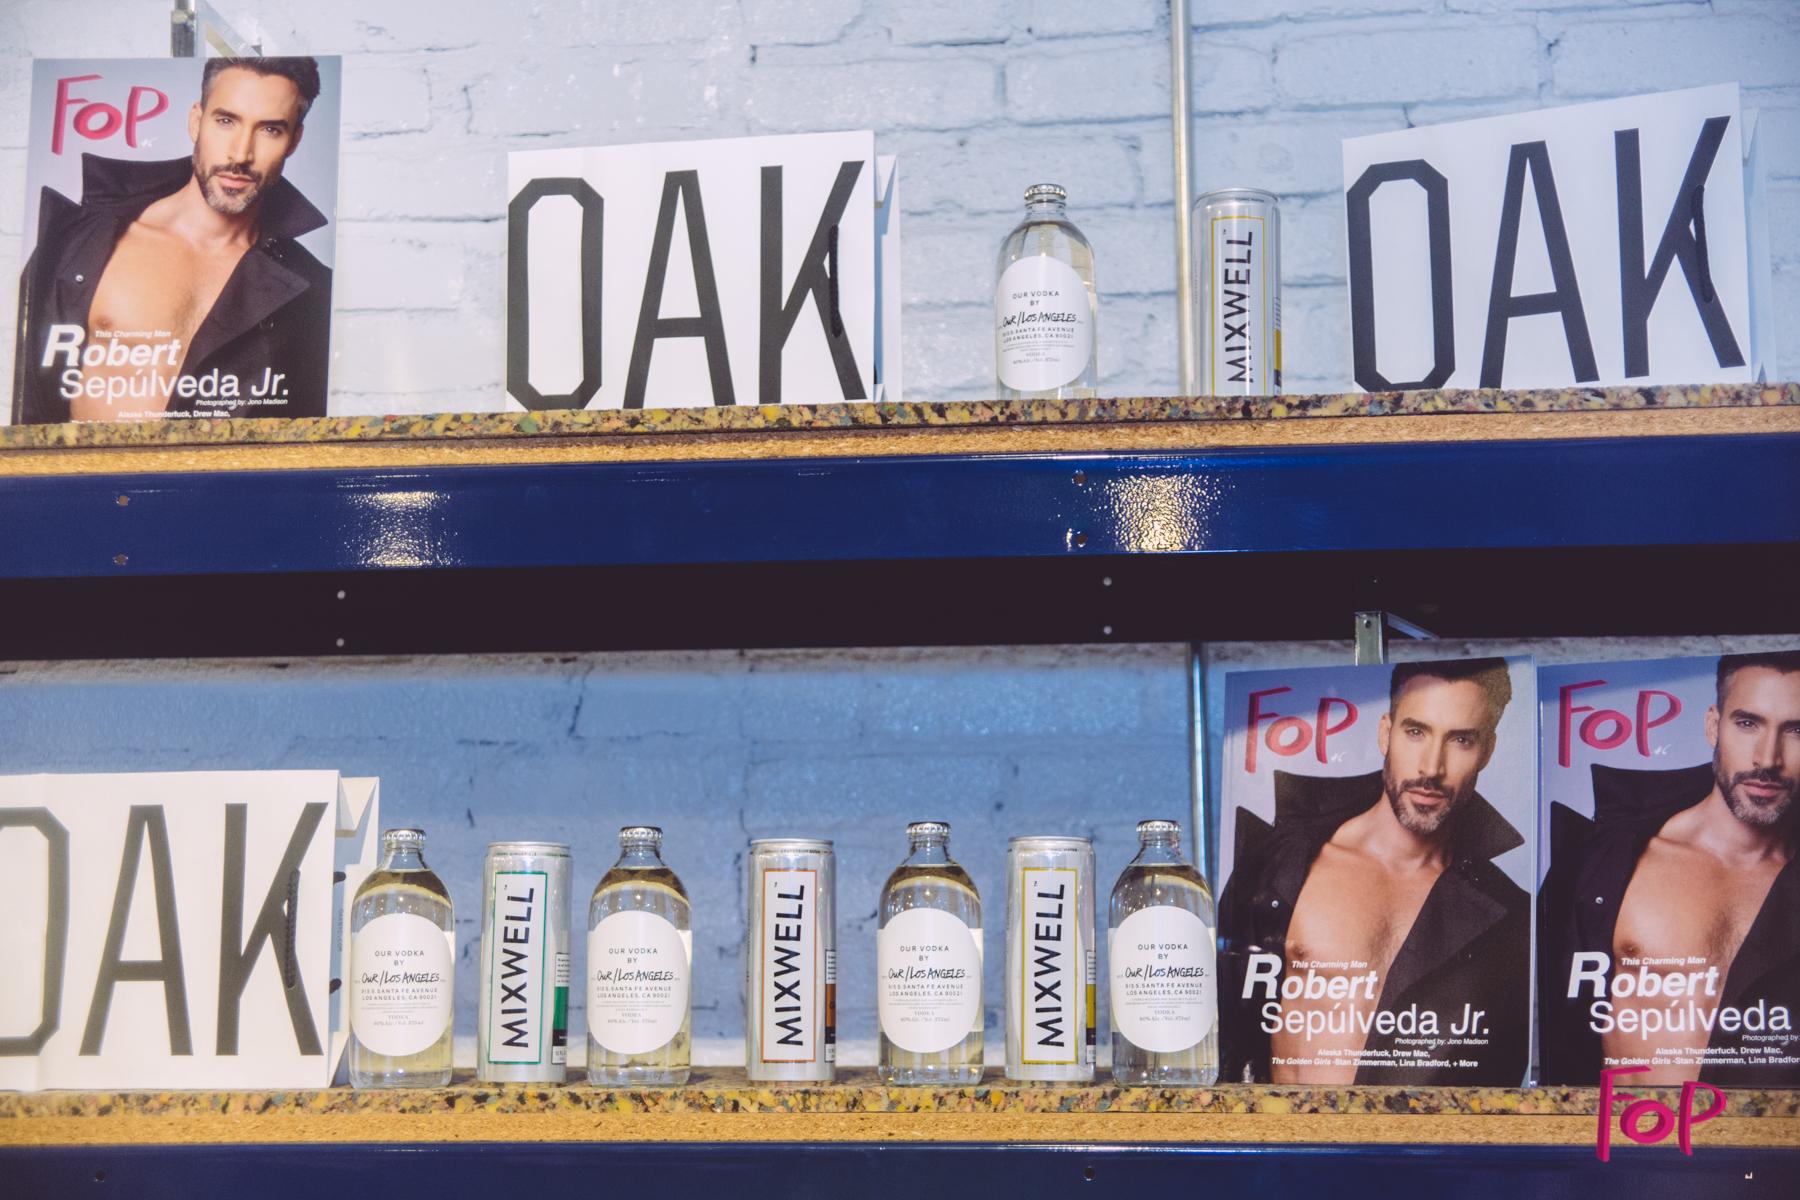 Sponsors: OAKNYC, Our Vodka. Mixwell